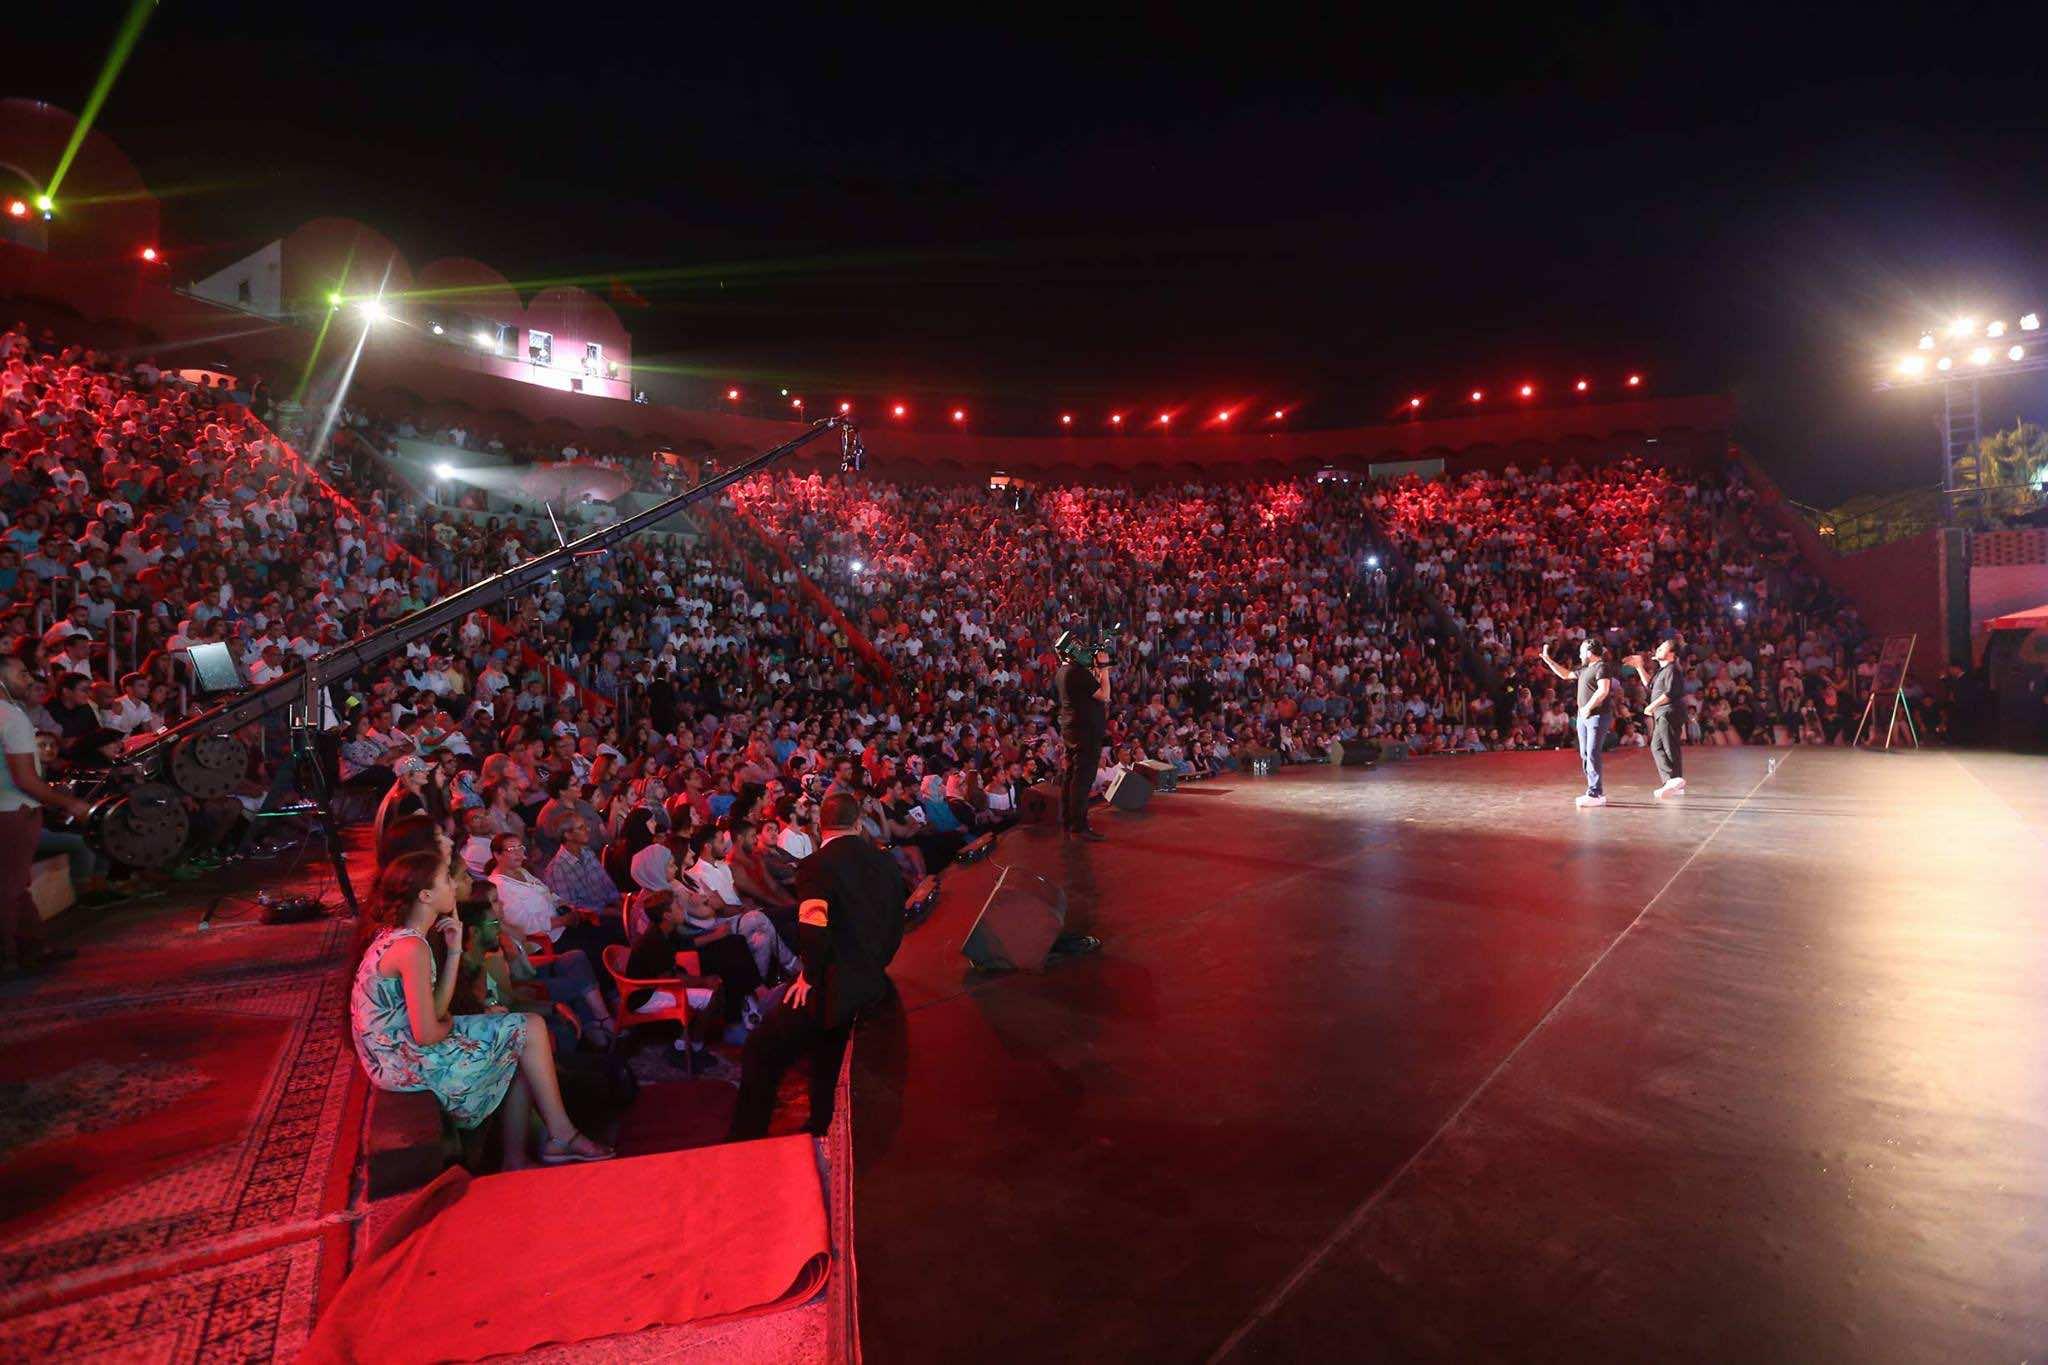 Agadir International Laughter Festival: Tackling Social Issues Through Humor